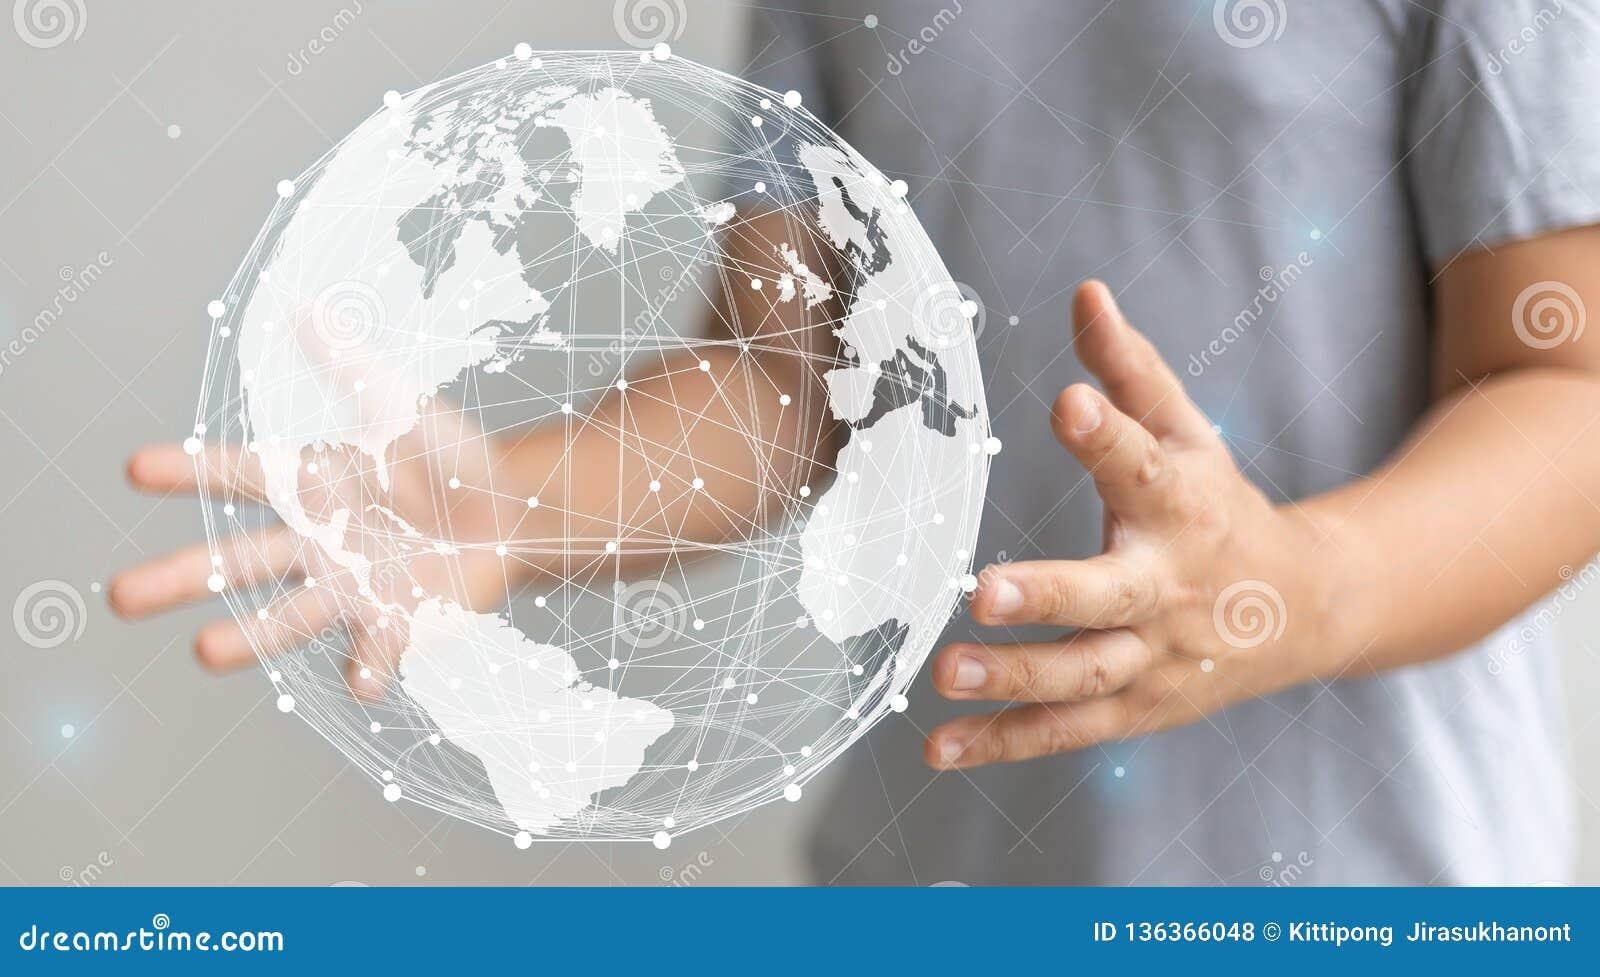 Hand present world graphic